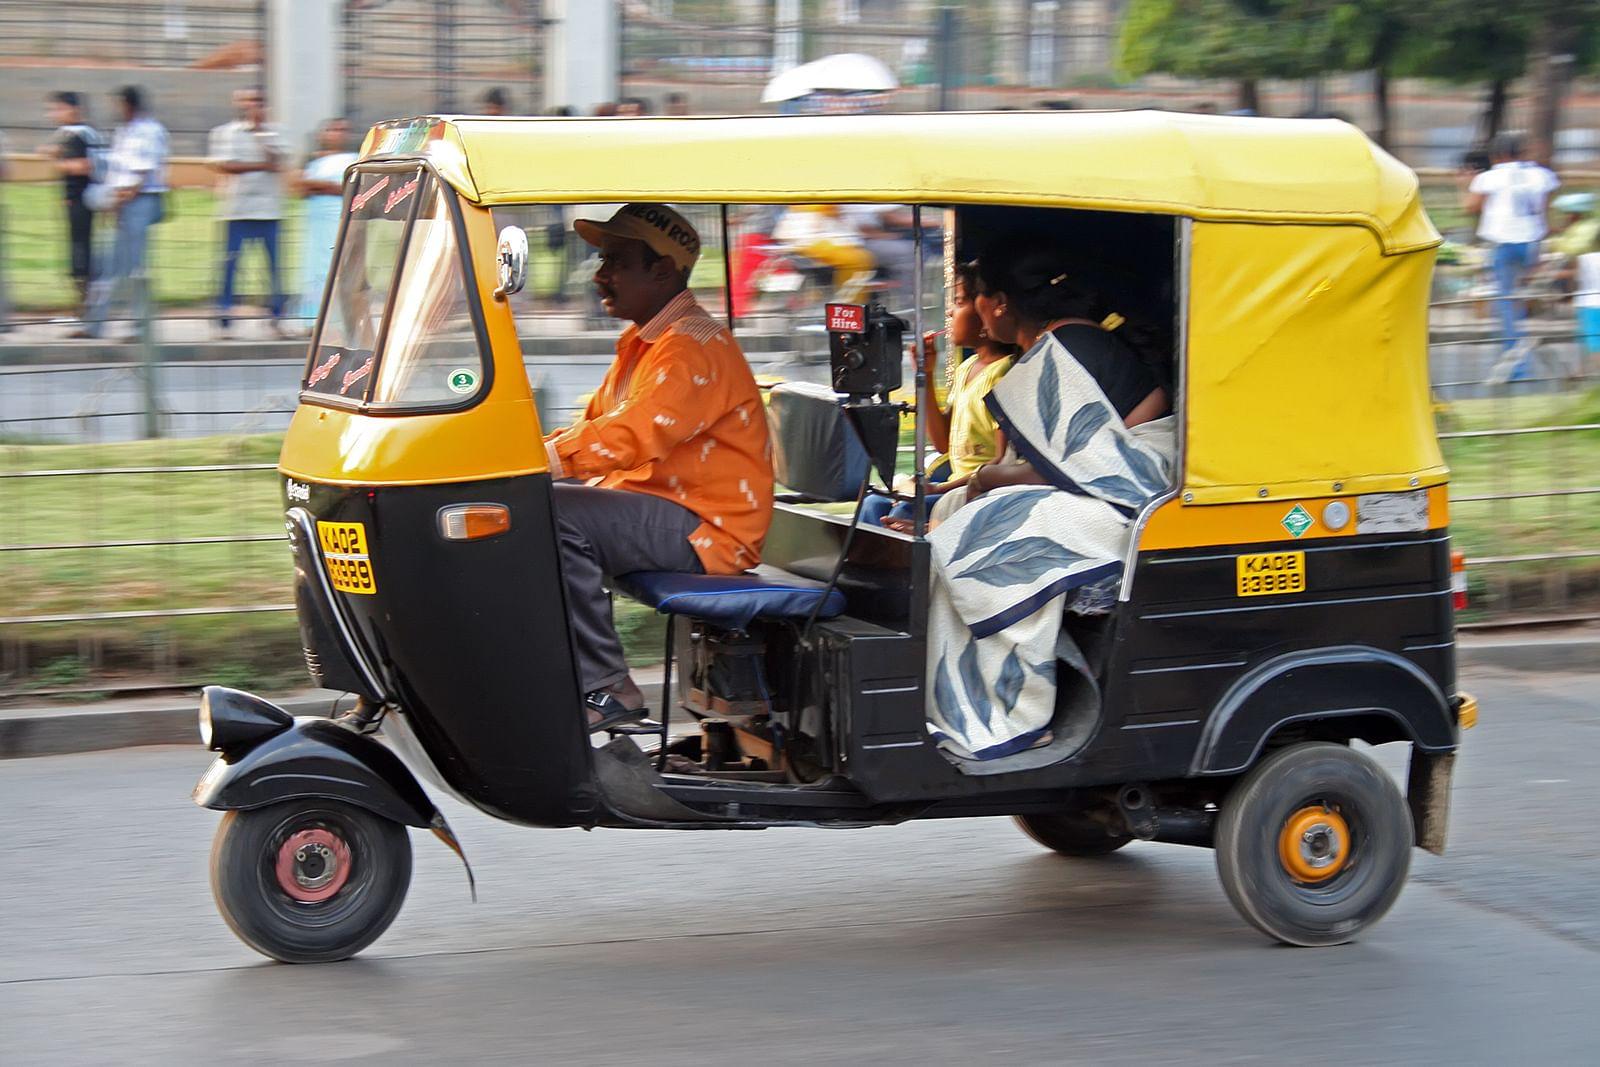 Chennai Şehir İçi Ulaşım